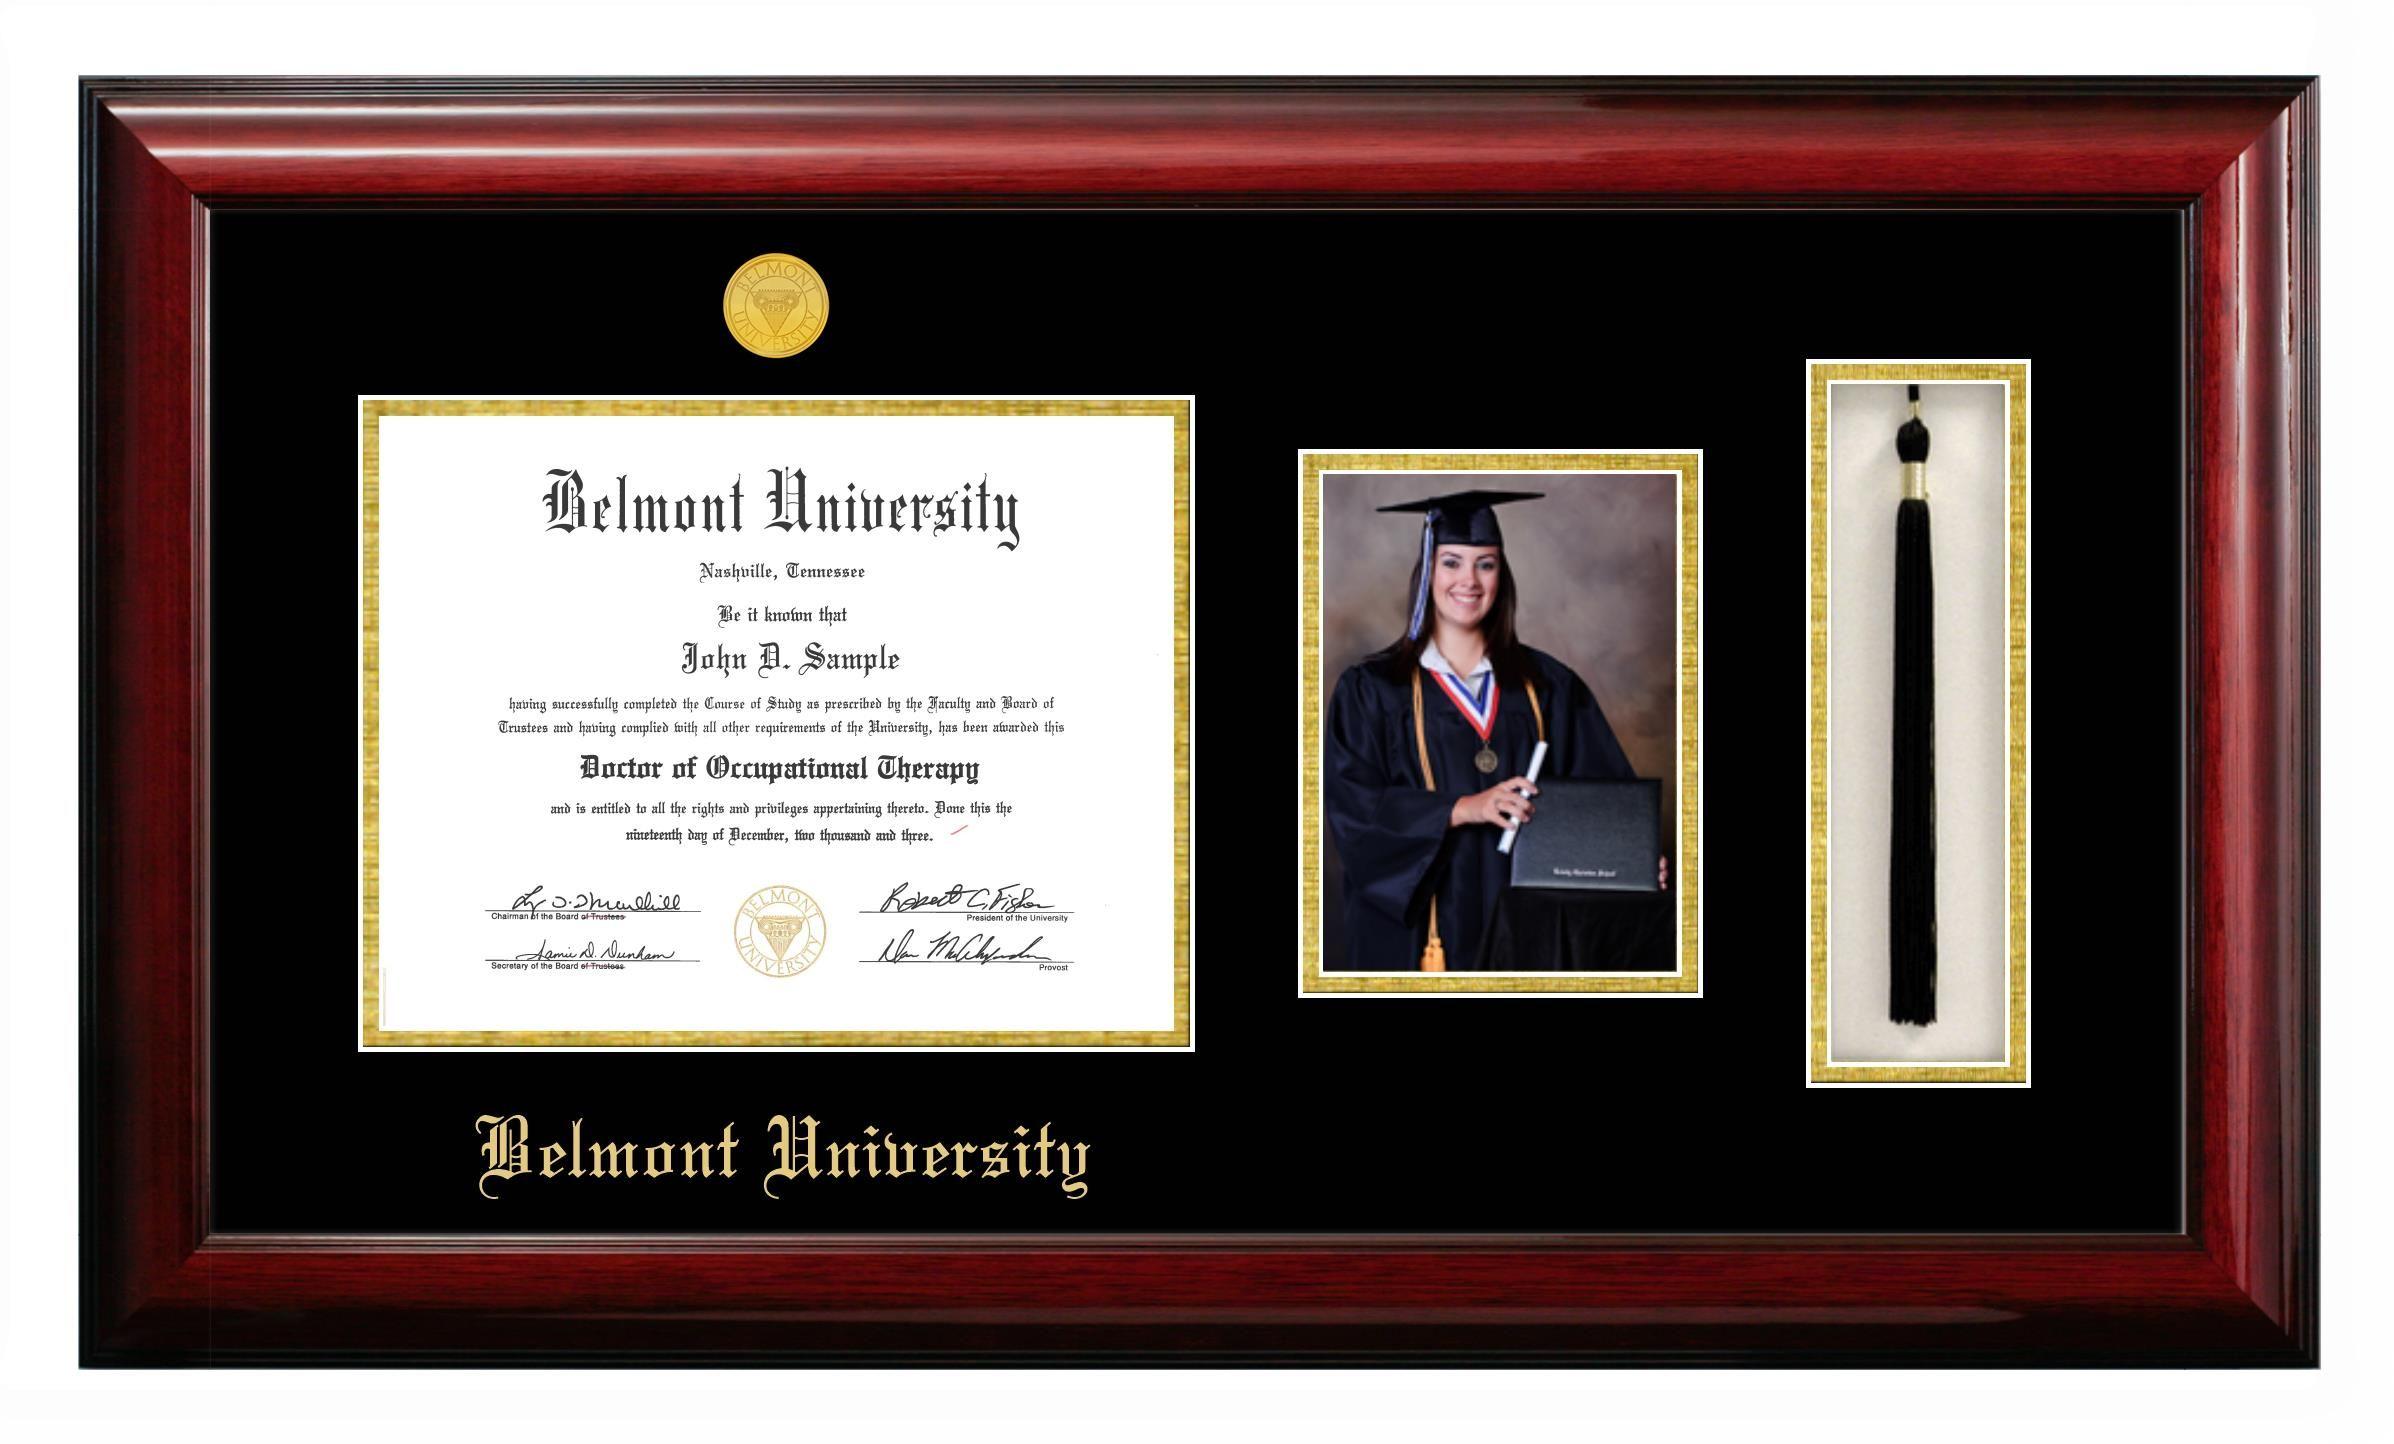 Price 265 00 Belmont University Diploma Frame With 5 X 7 Portrait And Tassel Box Diploma Frame Graduation Frame University Document